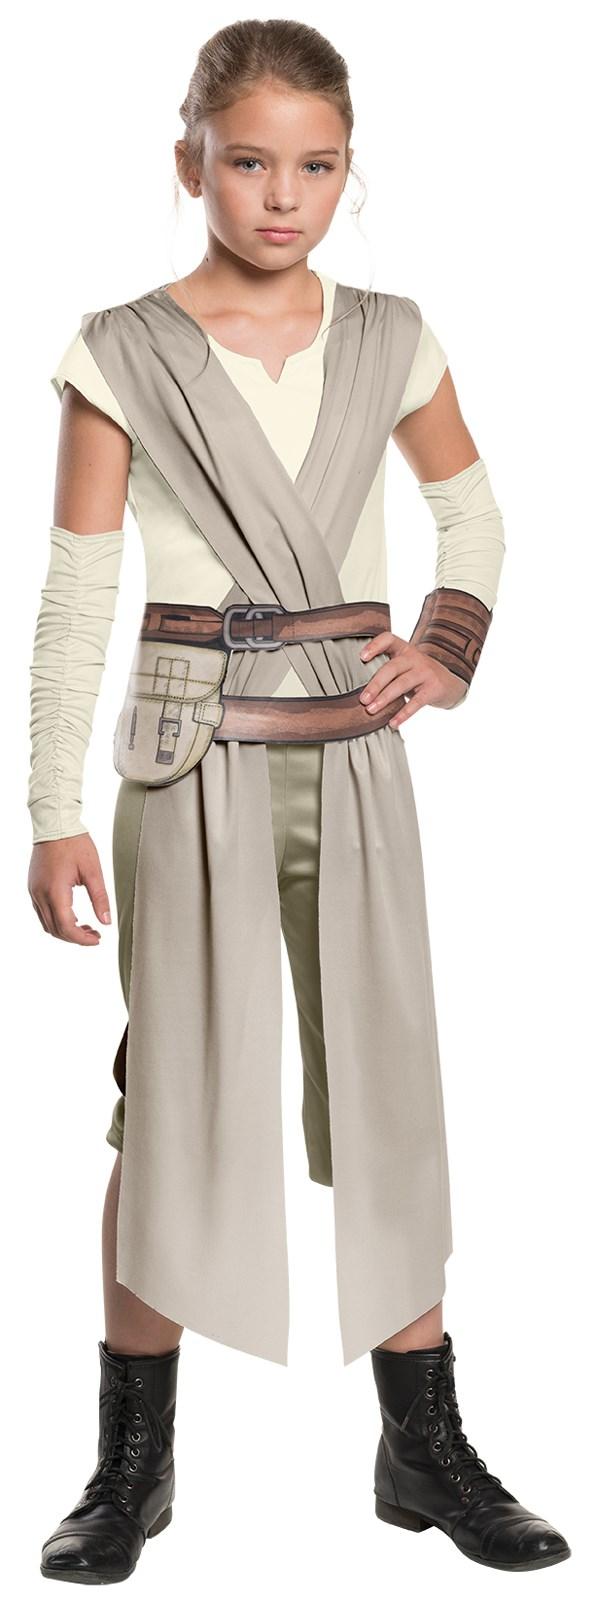 star wars: the force awakens - girls rey classic costume